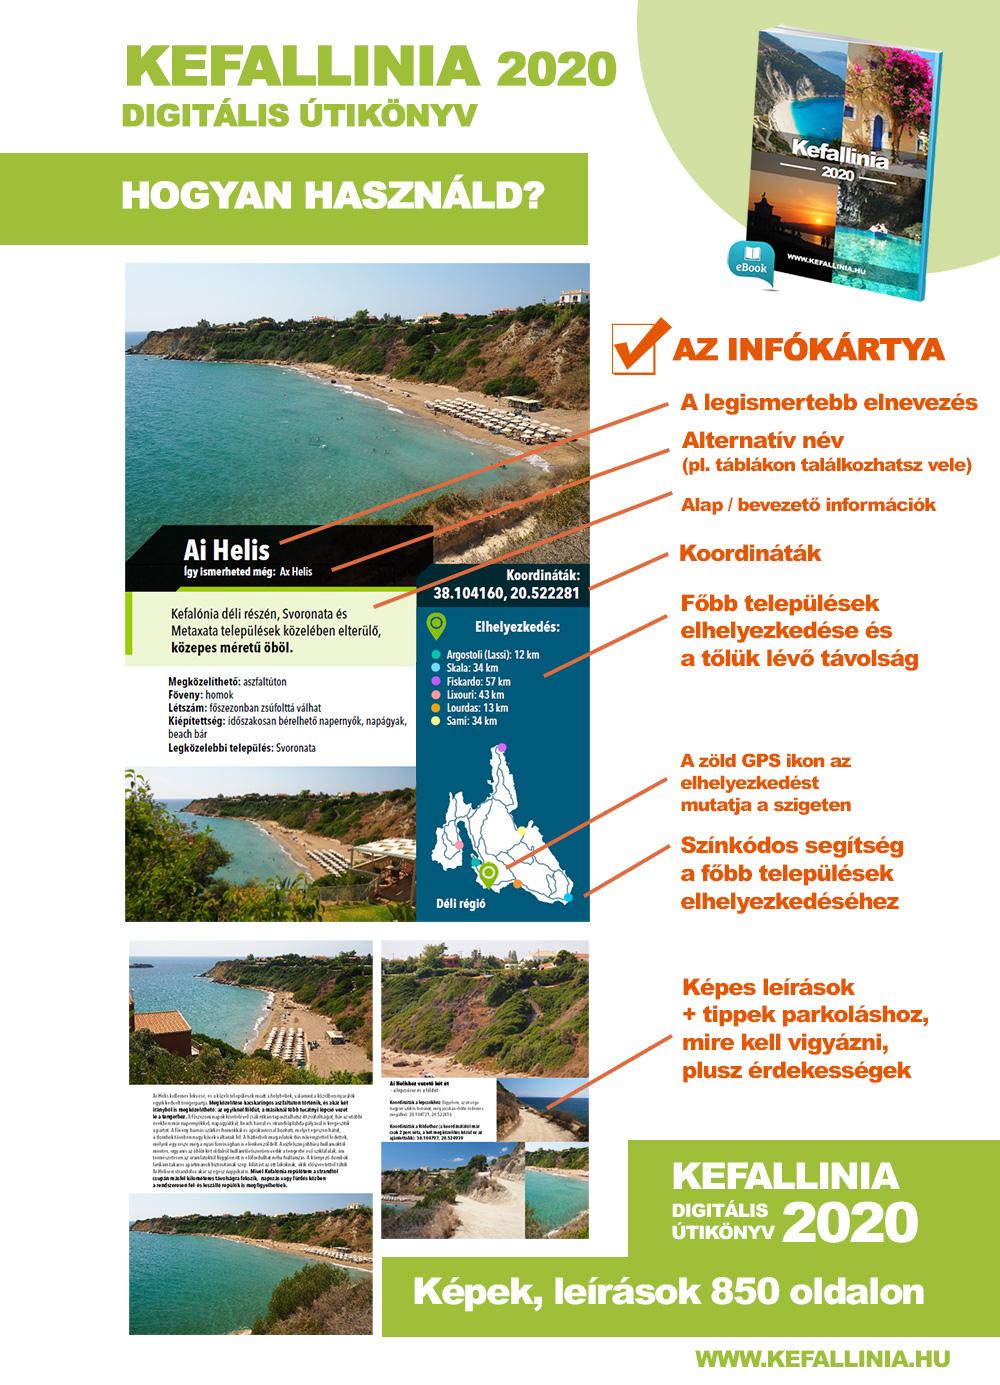 Kefallinia digitális útikönyv